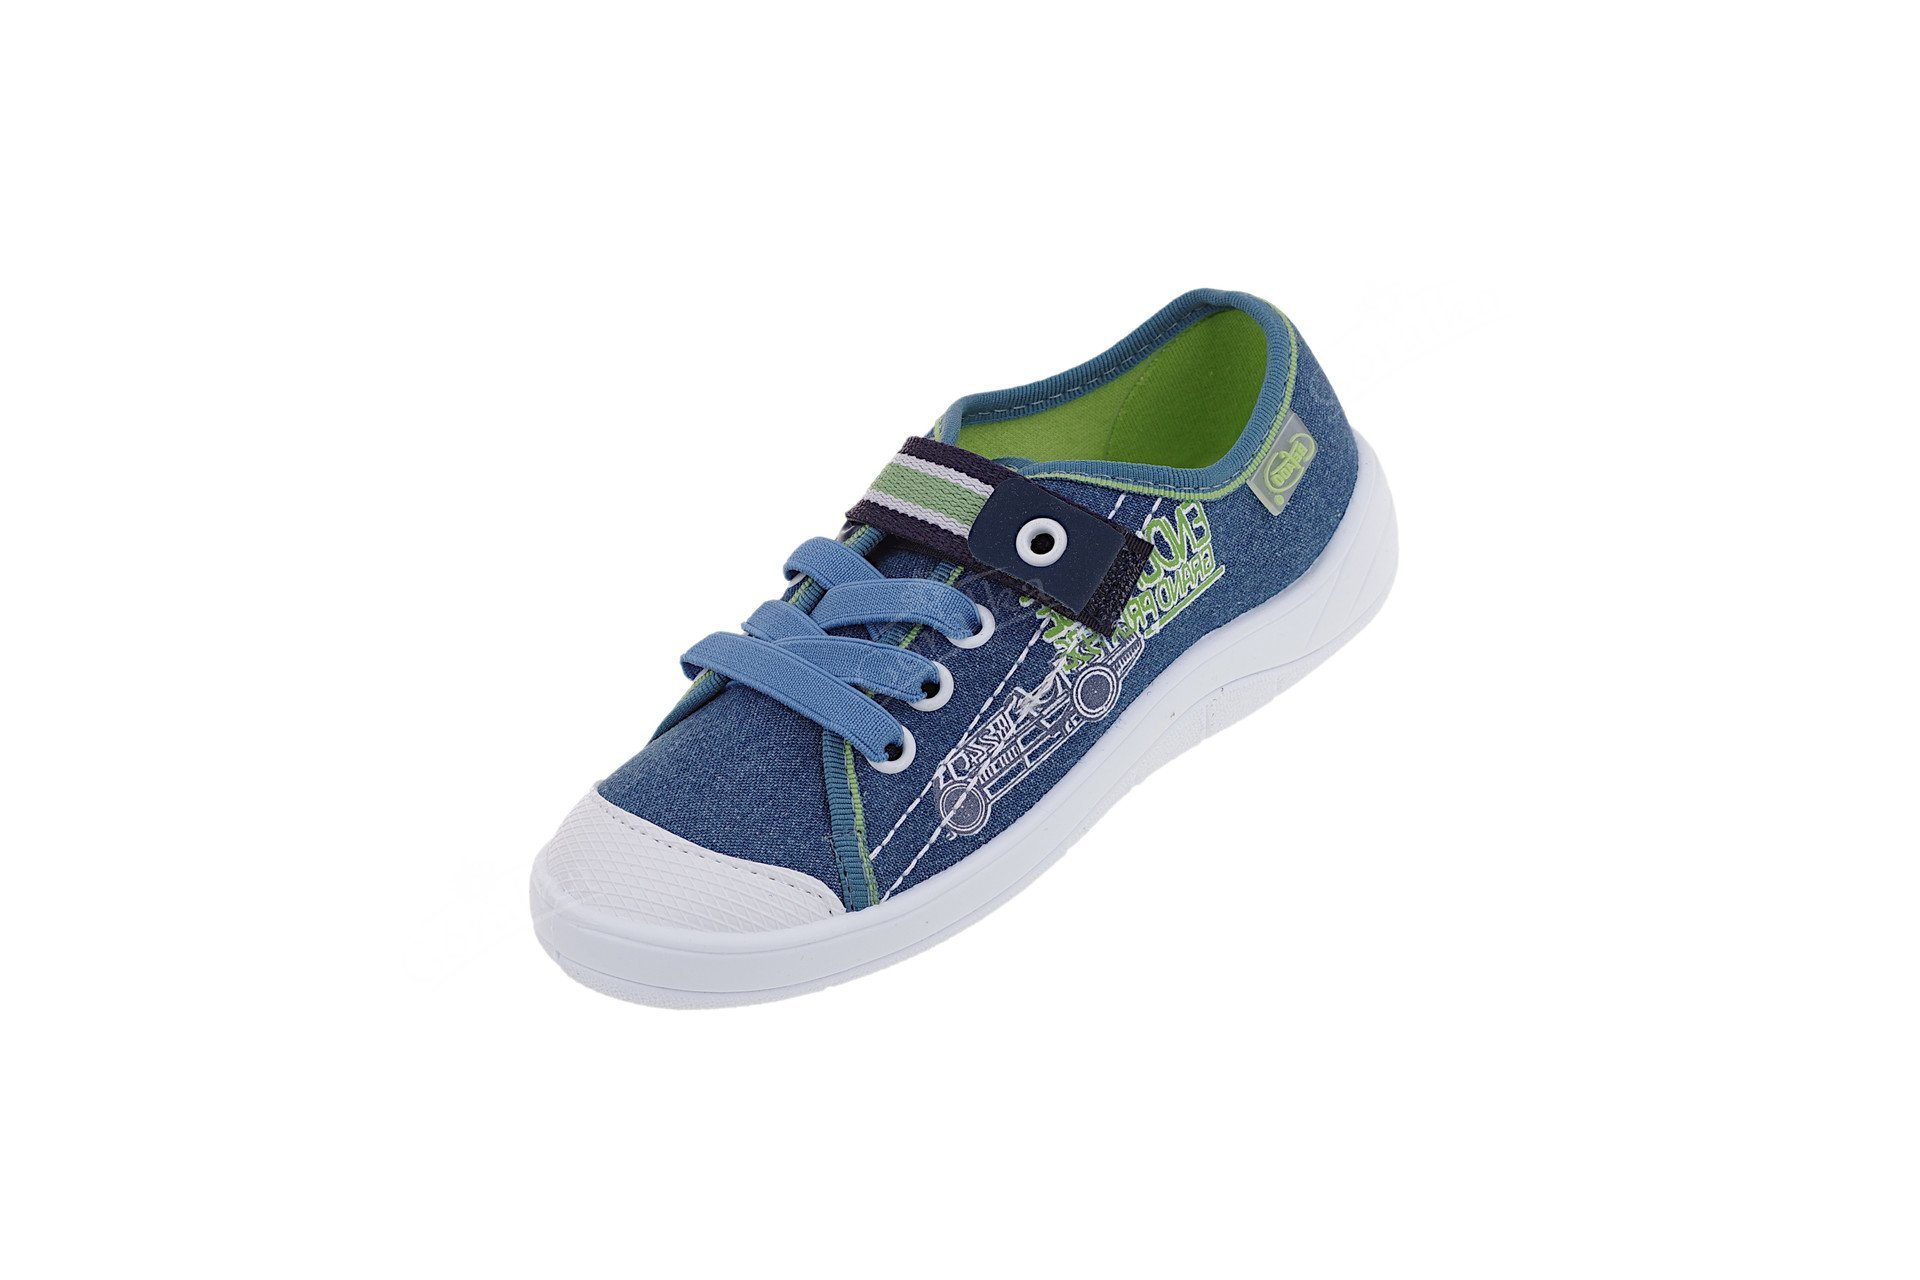 5b27f45baa83c Trampki dla chłopca pantofle Befado 251X093 (r. 25-28) - Góralka